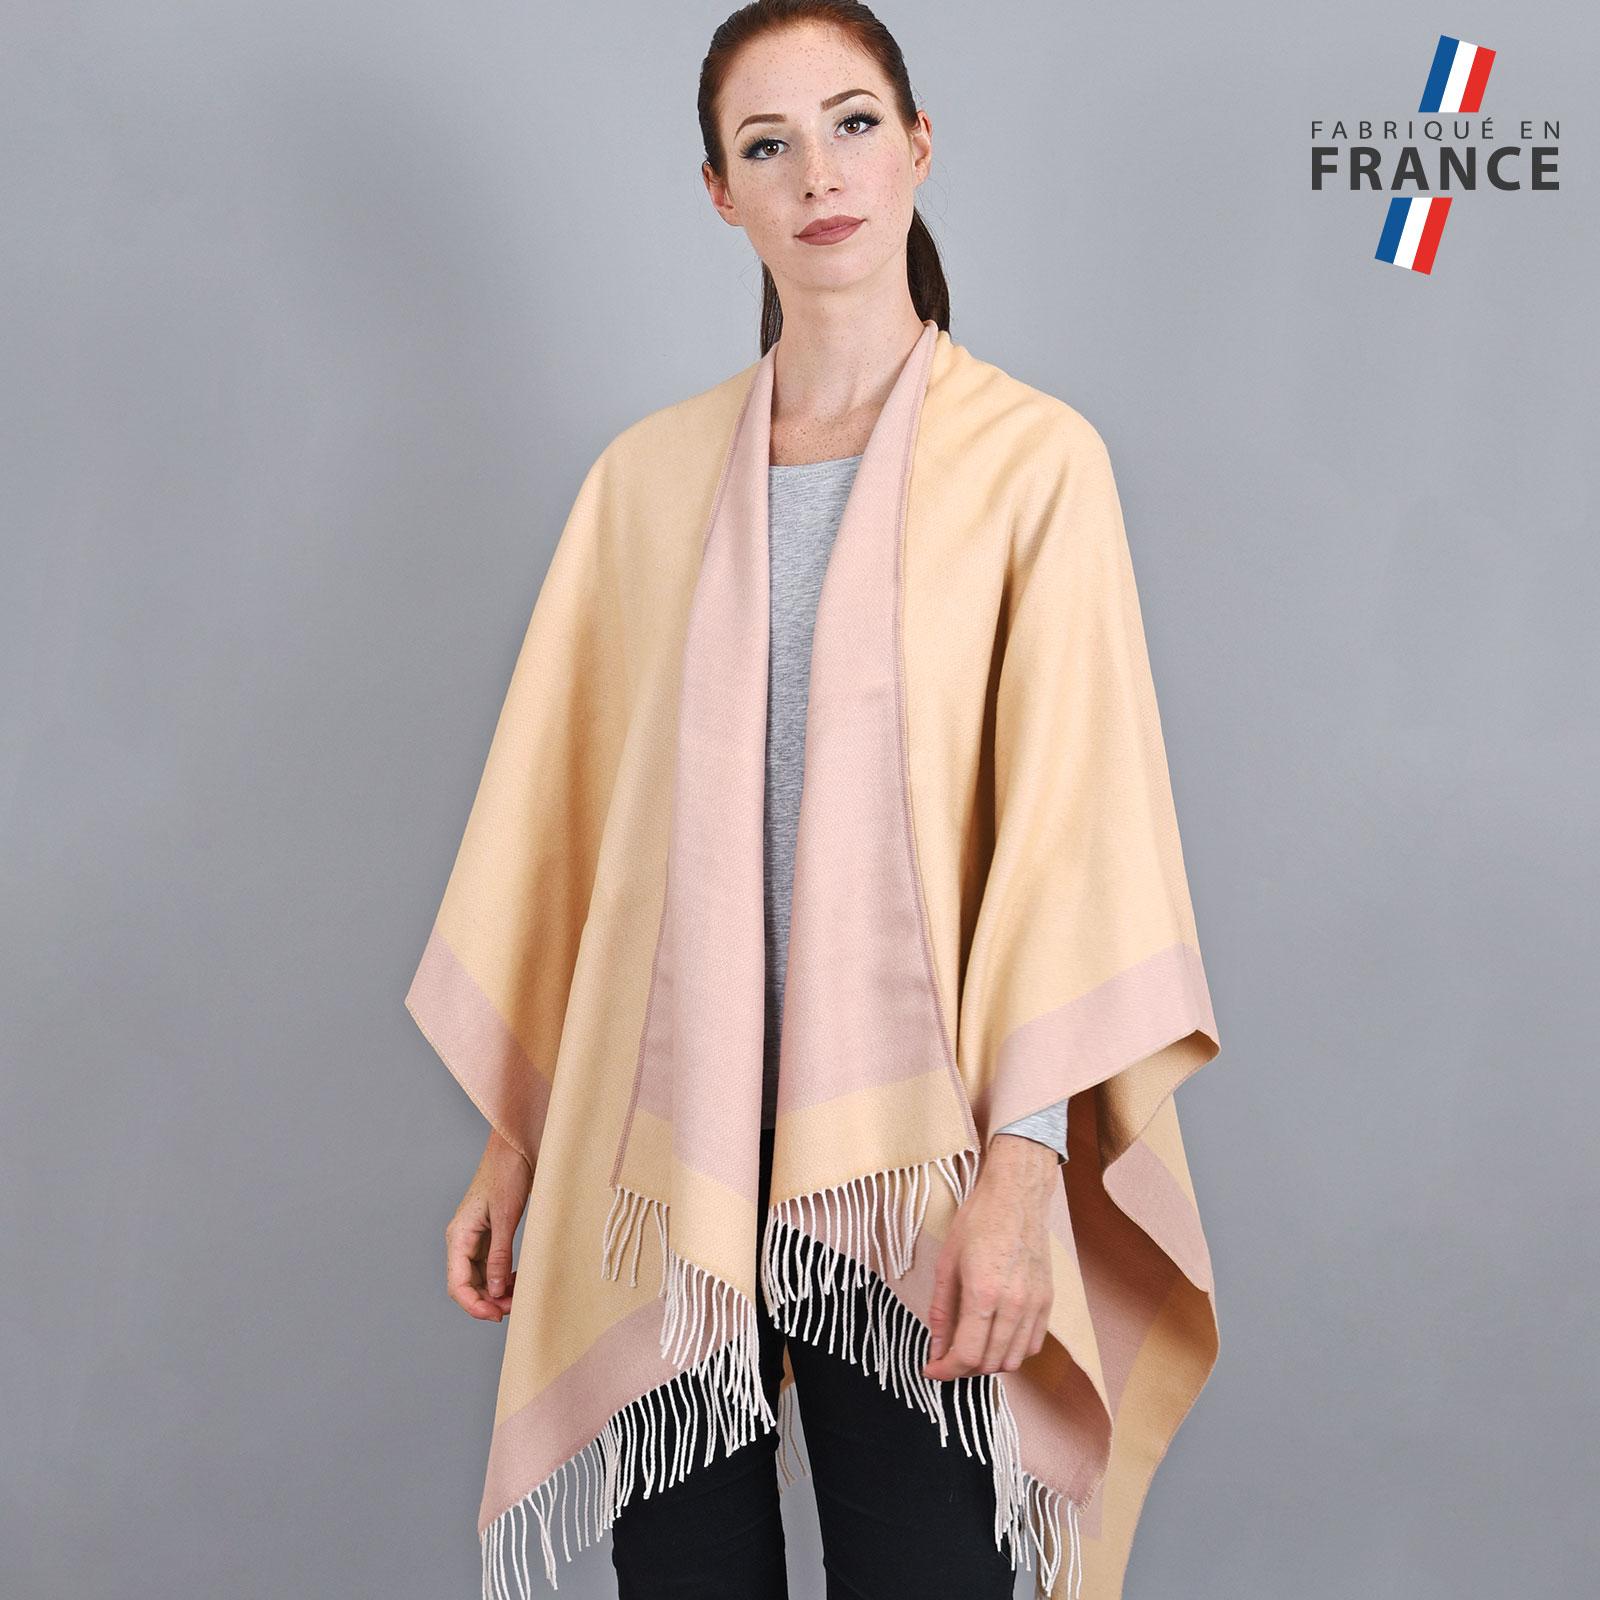 AT-03205-VF16-2-LB_FR-poncho-a-franges-femme-fabrication-france